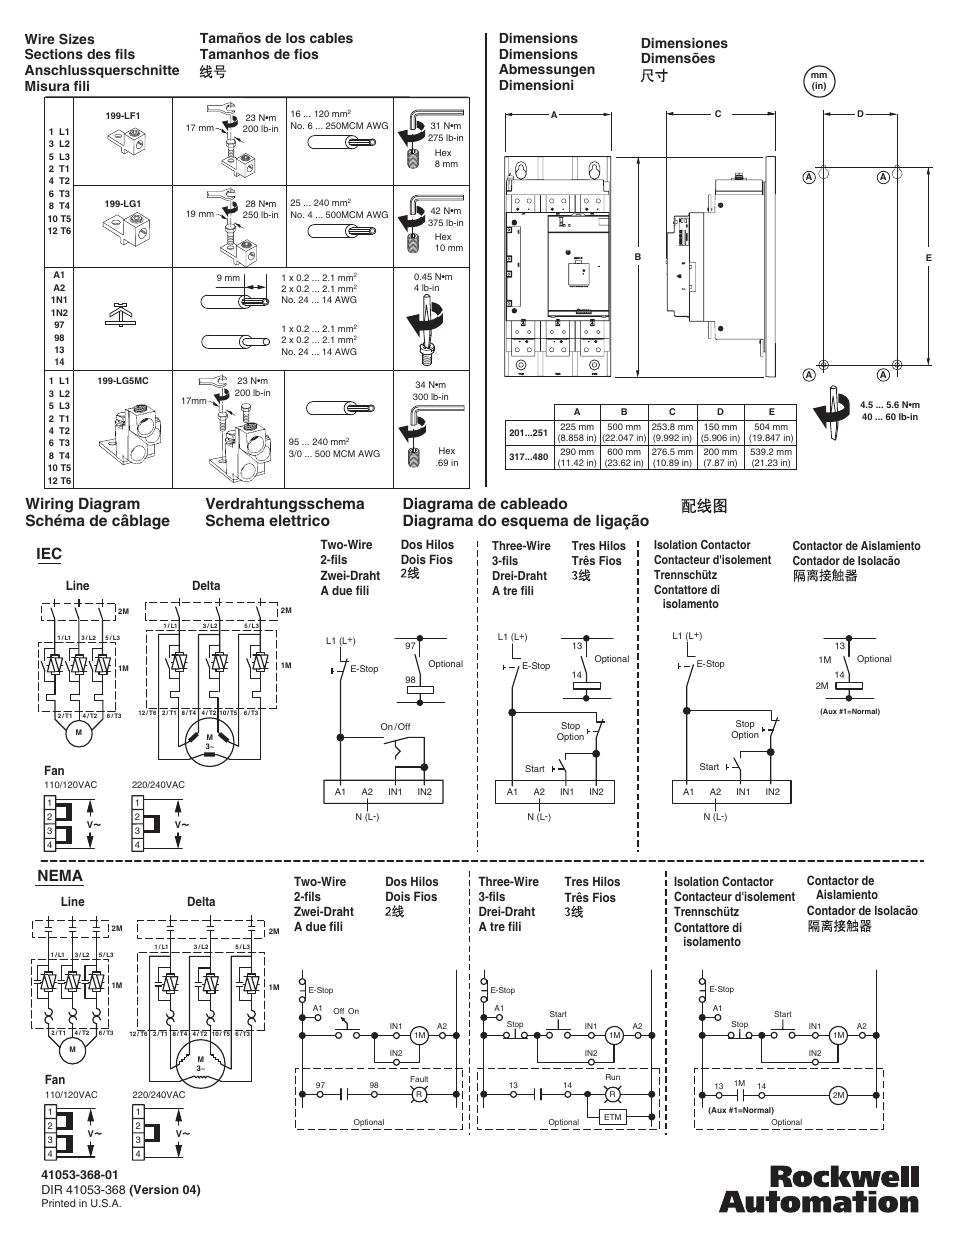 smc dc42 wiring diagram model